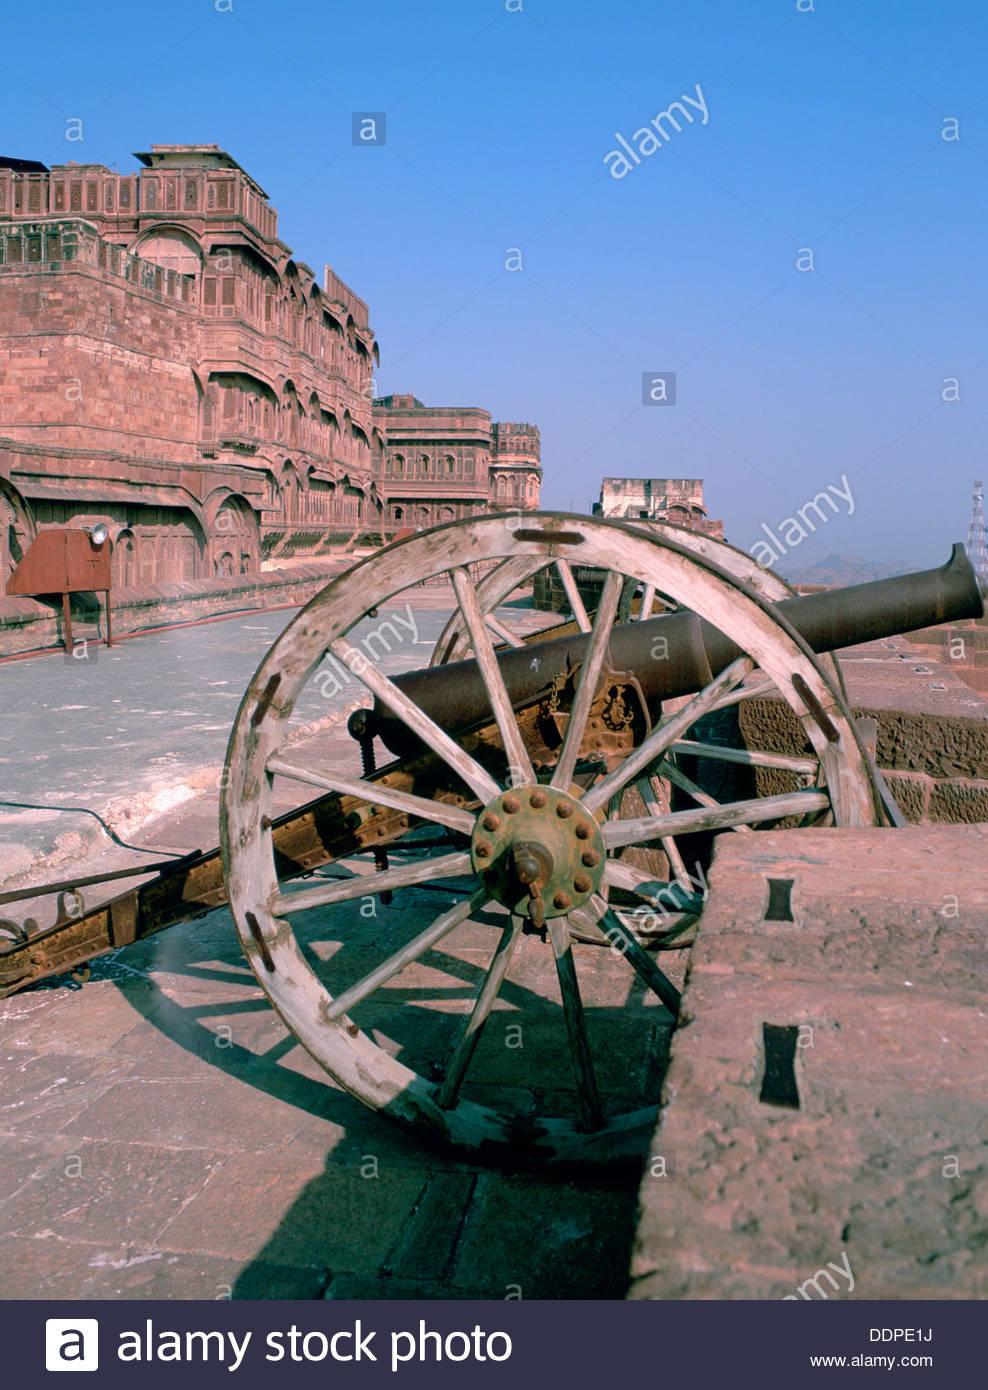 Cannon on the ramparts, Mehrangarh Fort, Jodhpur, Rajasthan, India. Artist: Dr Stephen Coyne - Stock Image